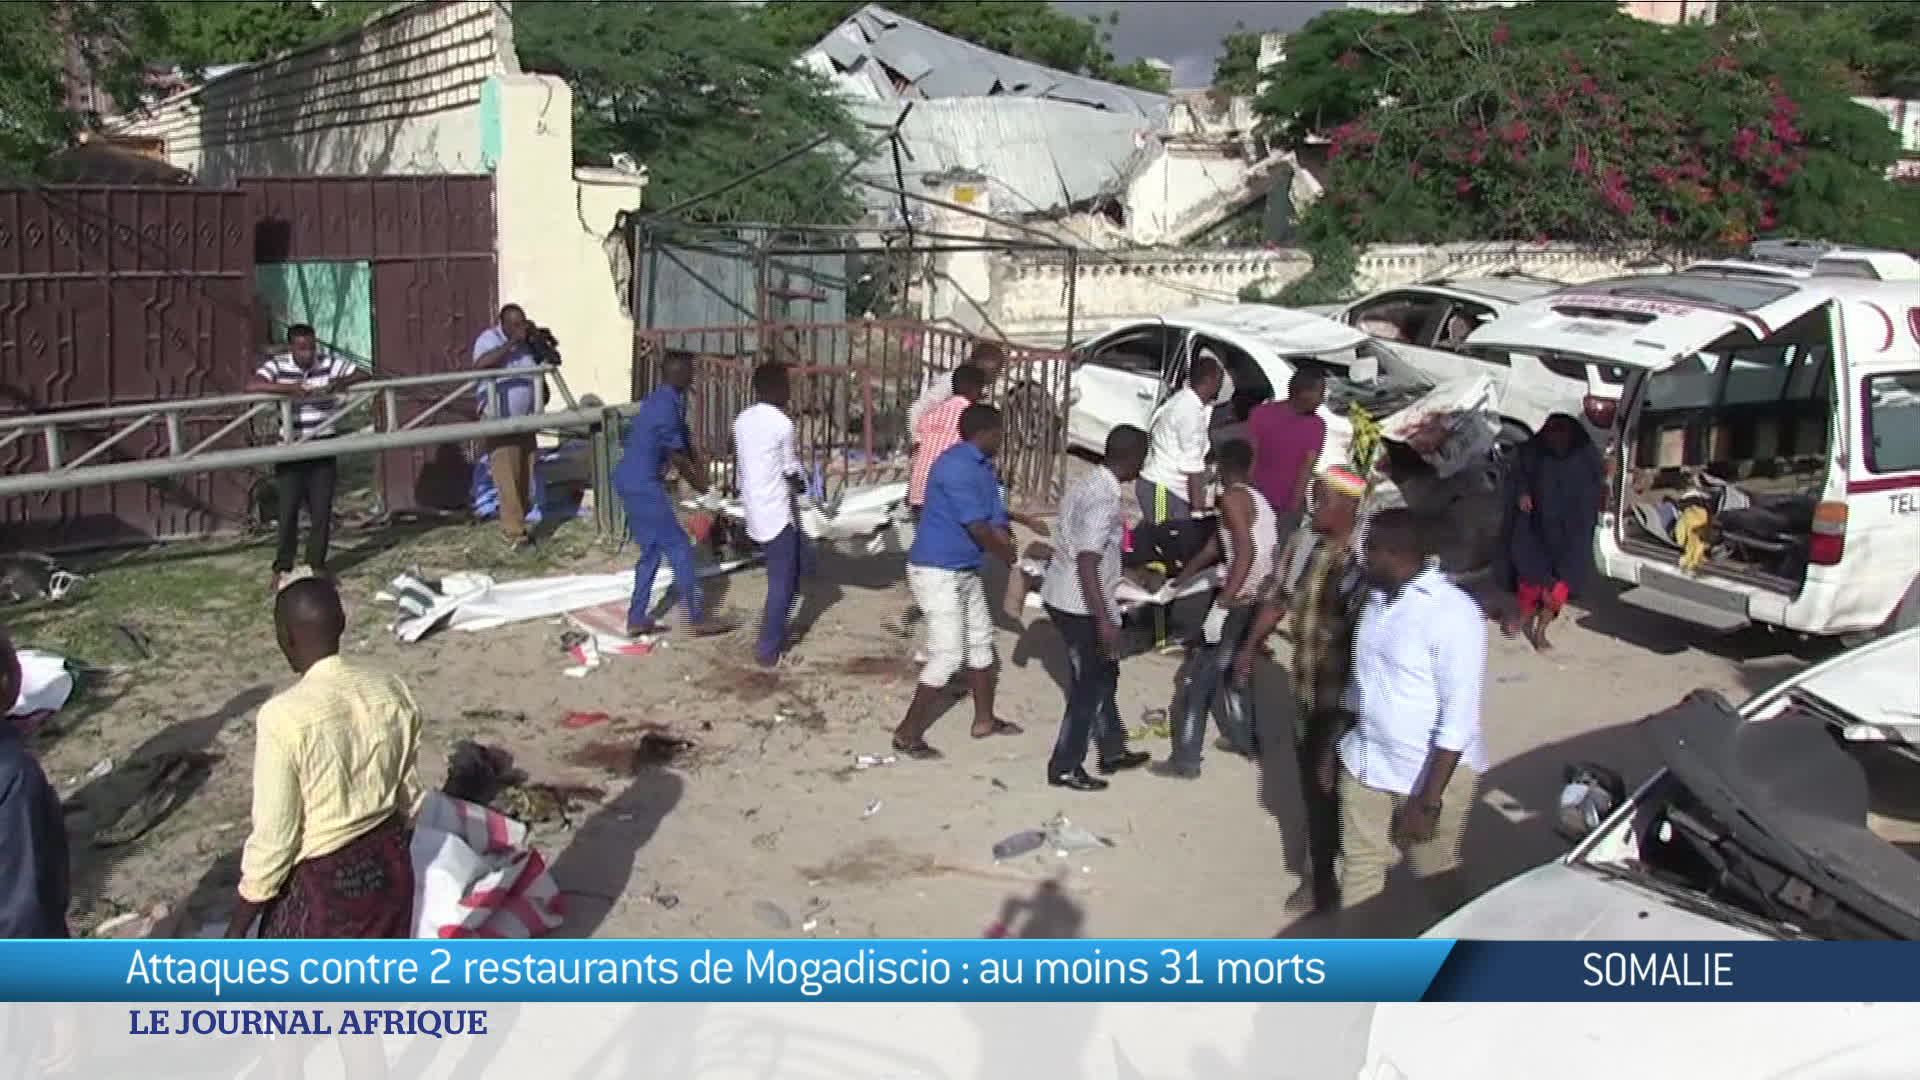 Somalie : attaques contre 2 restaurants de Mogadiscio, au moins 31 morts